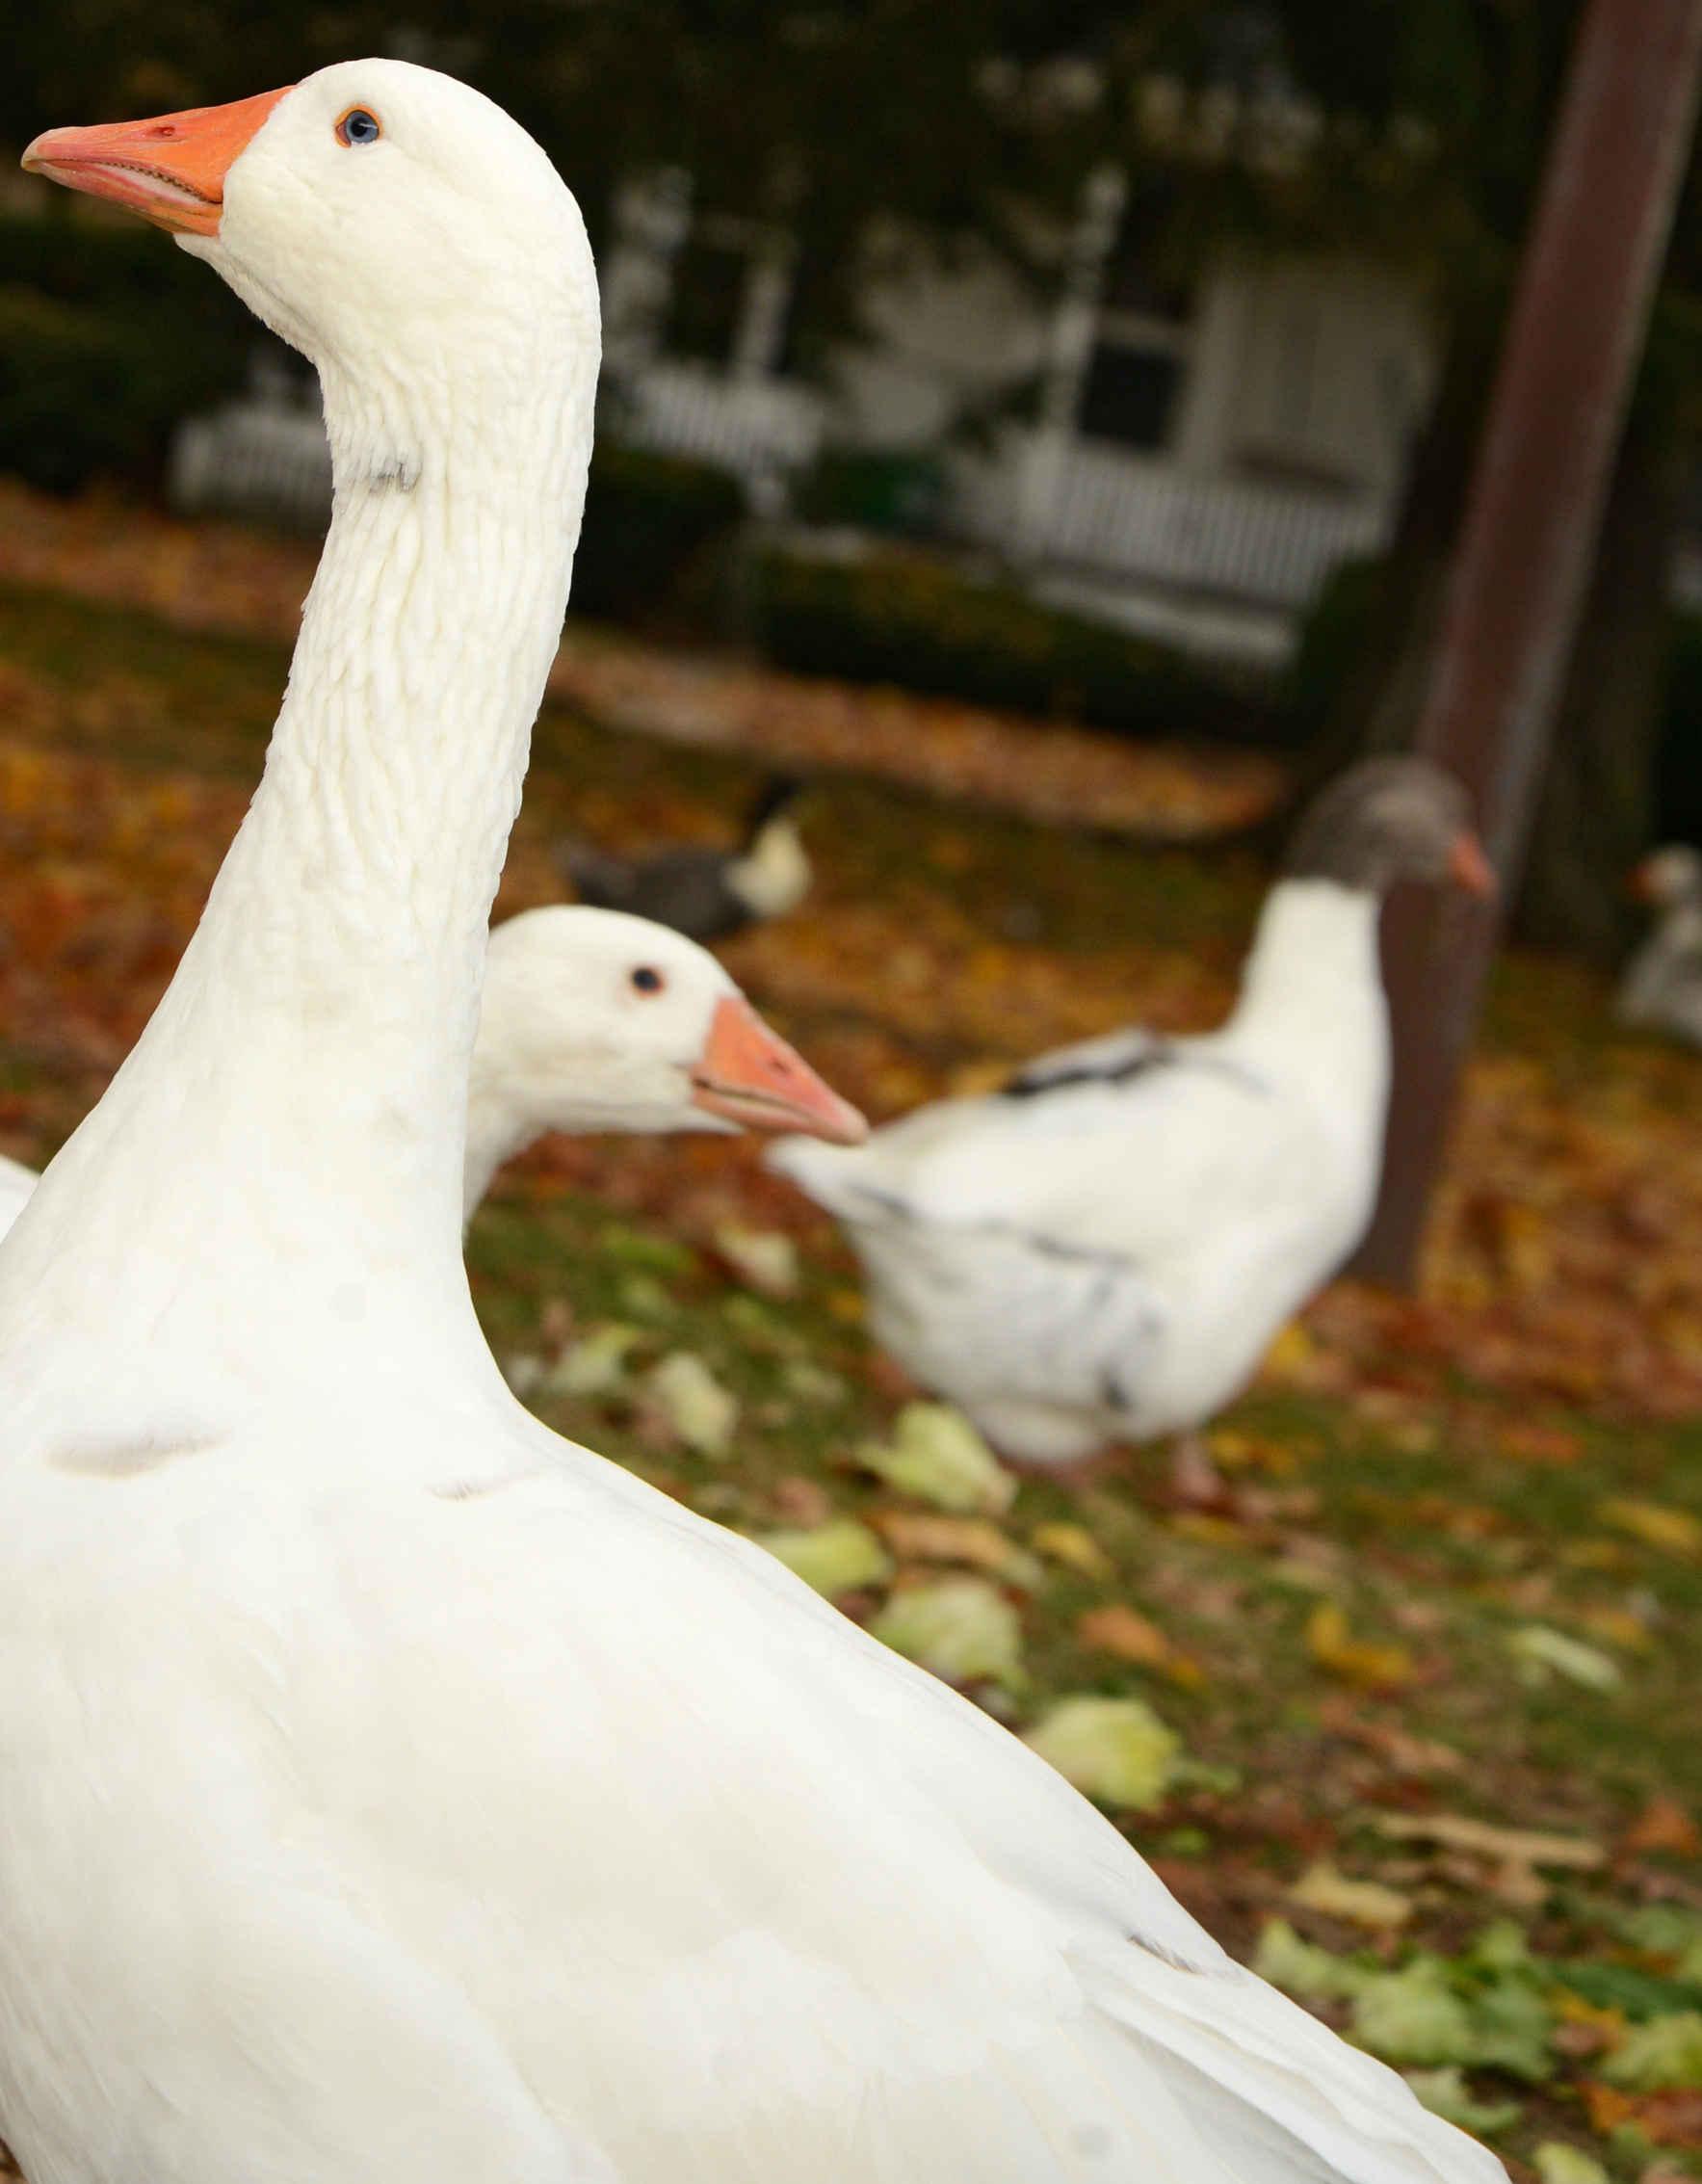 Sponsor a chicken, goose, or turkey image